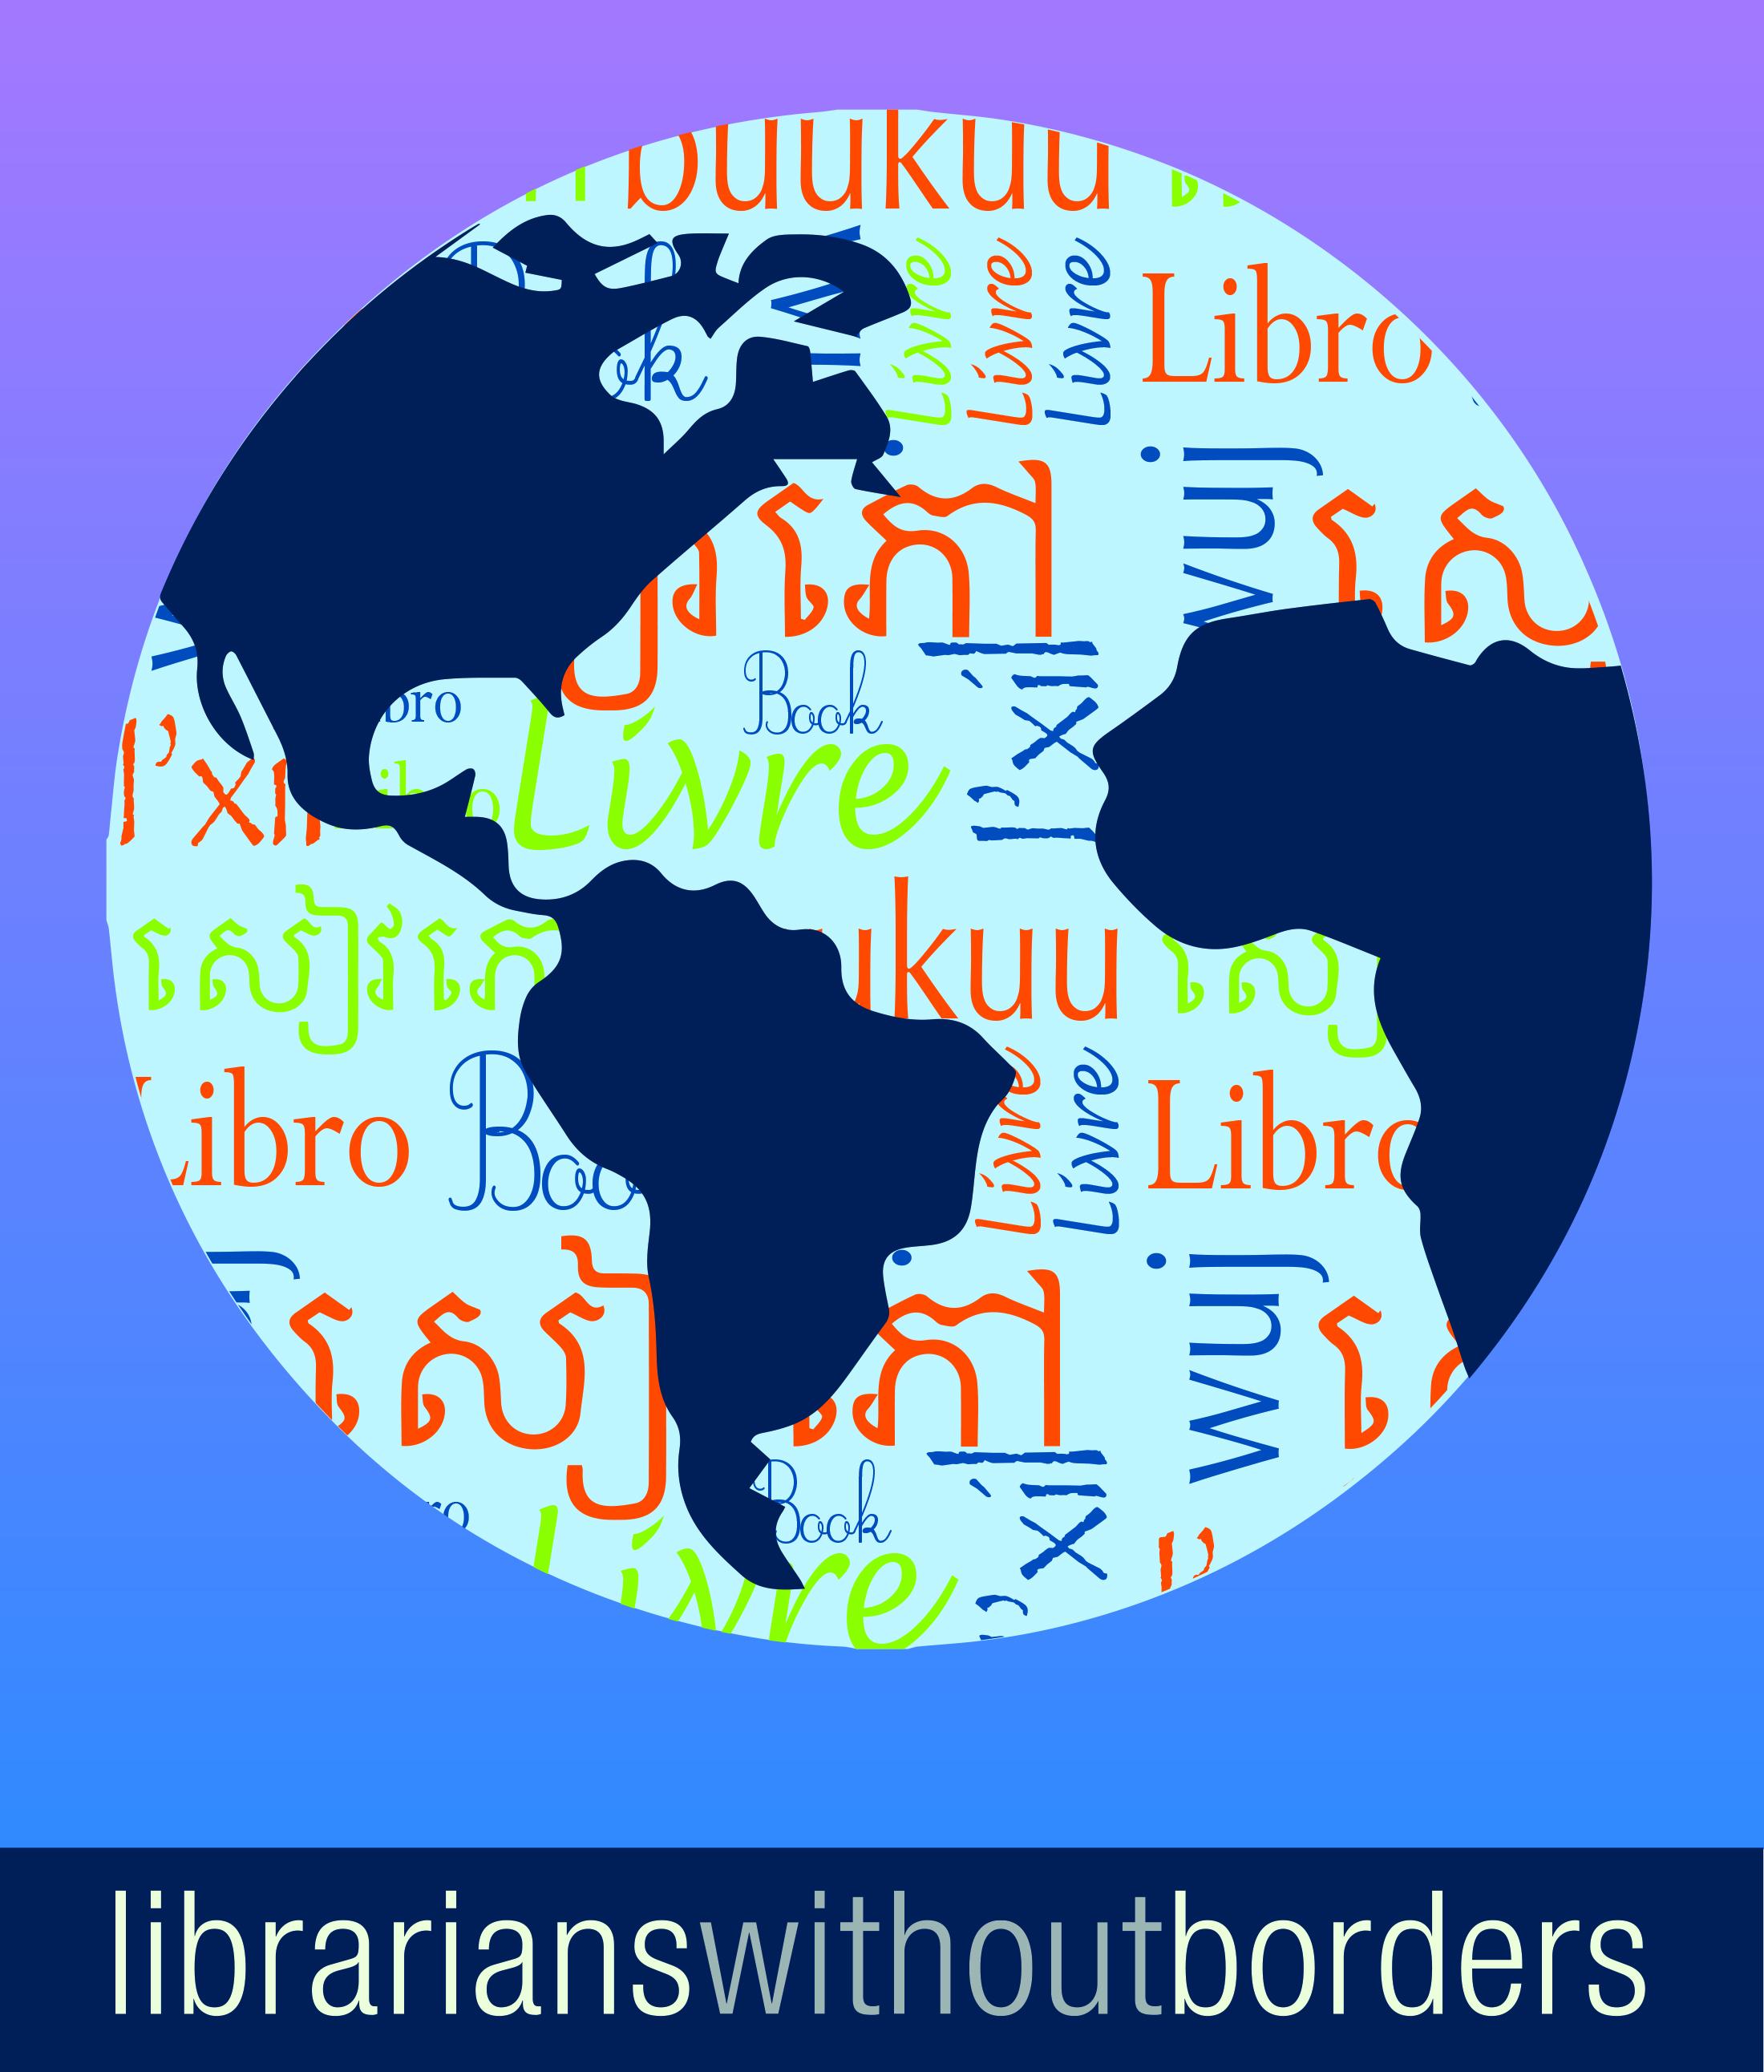 SKREENED_tee_template_globe (1) copy copy.jpg